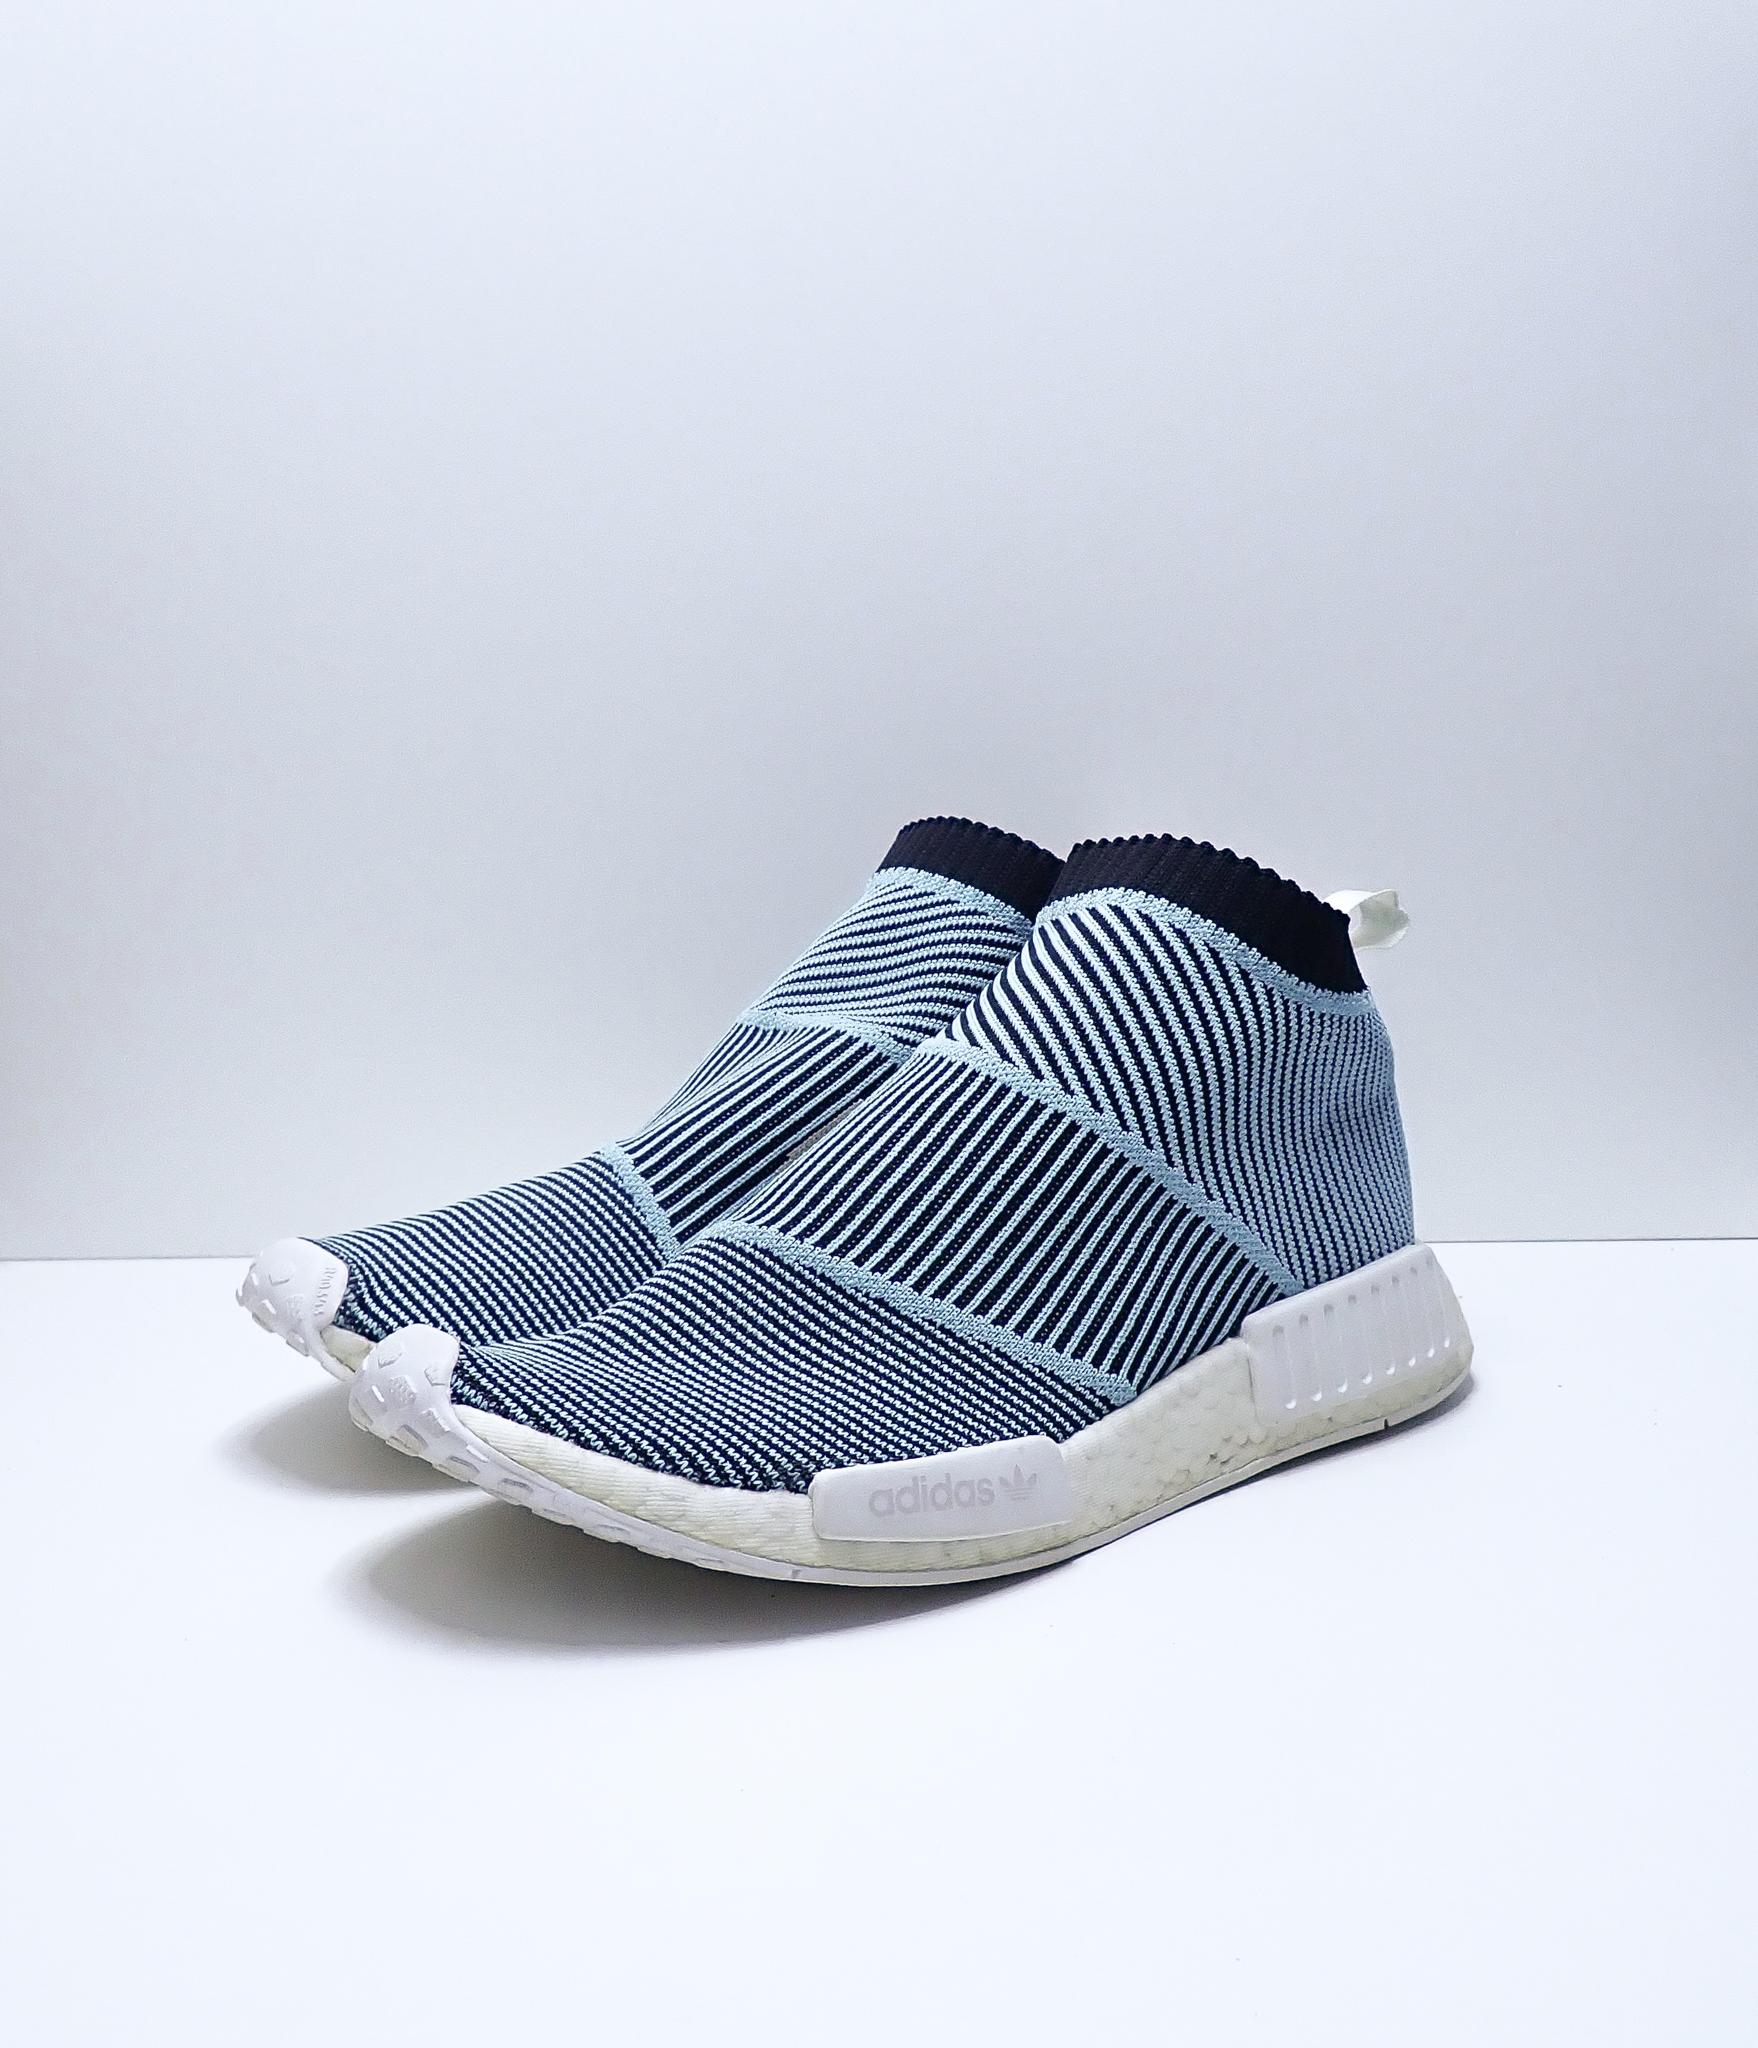 Adidas NMD CS1 Parley Blue Spirit